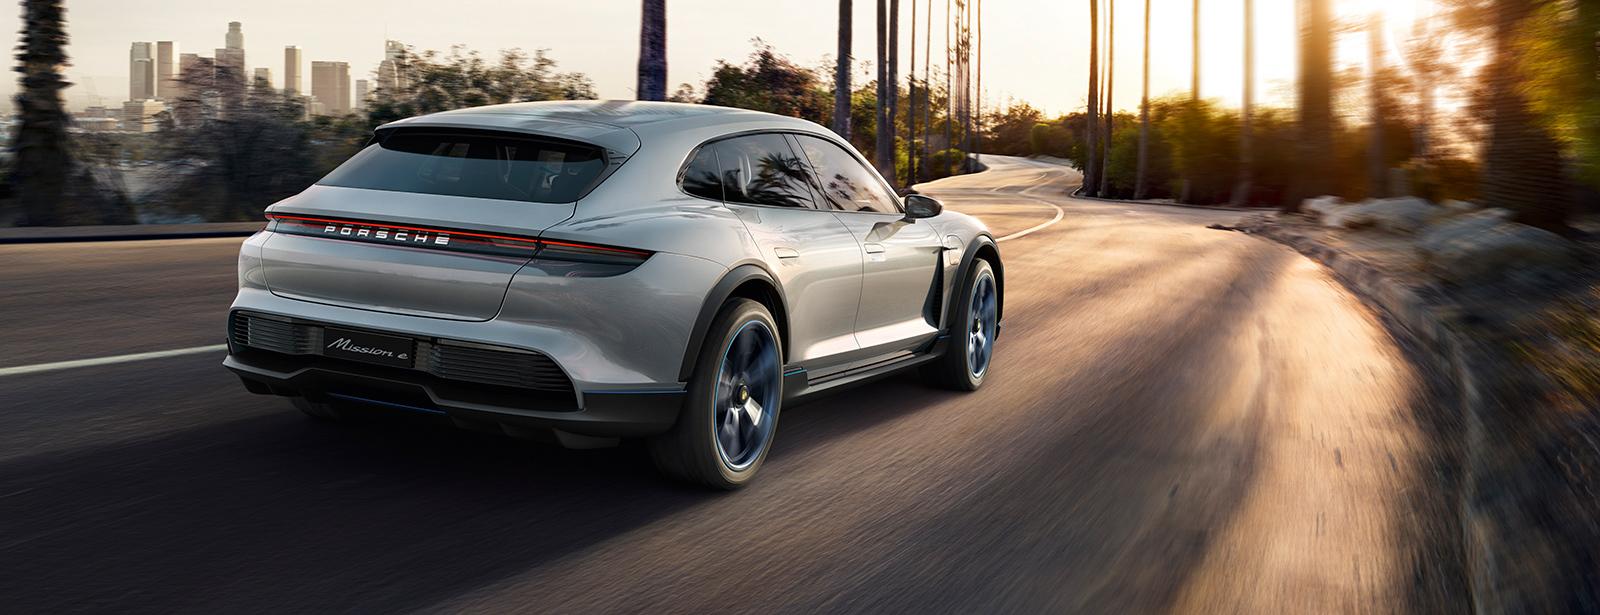 Porsche Mission E Cross Turismo Aktuelles Juni 2018